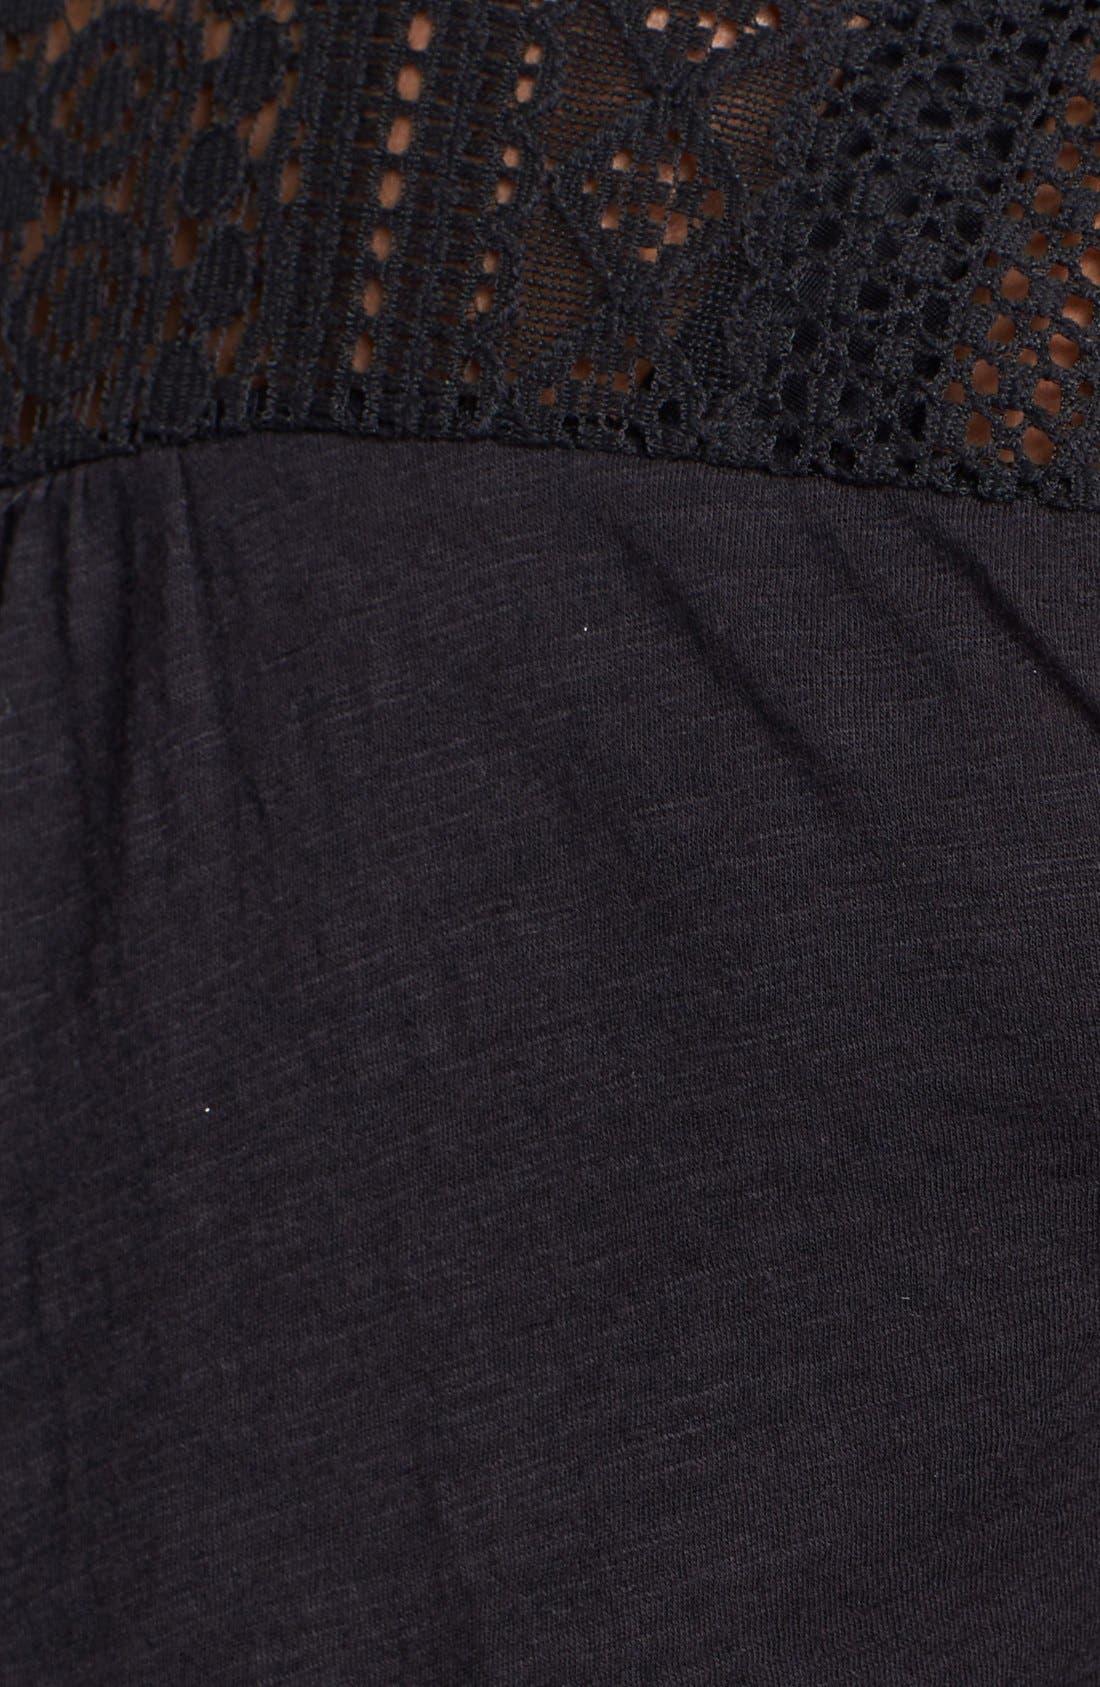 Alternate Image 3  - Lucky Brand Lace Tuxedo Bib Top (Plus Size)